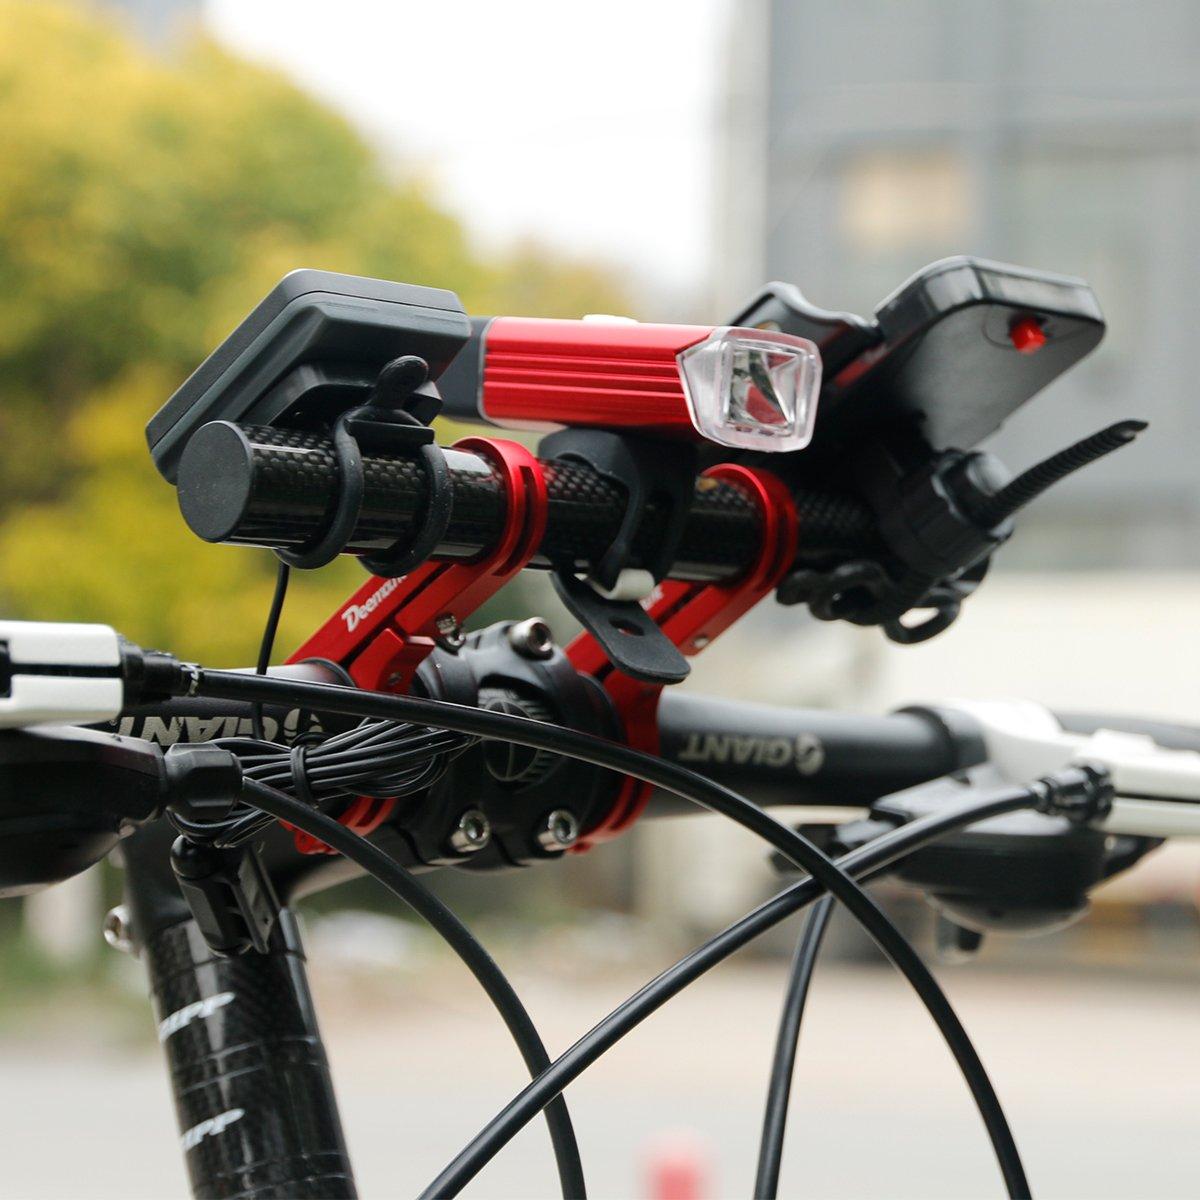 DEEMOUNT Bike Handlebar Extension Rack 202mm Bicycle Double Clamp Bracket Carbon Fiber Extender Accessories Flashlight Lamp Phone Mount Bracket Stand Holder Space Saver - Red by DEEMOUNT (Image #3)